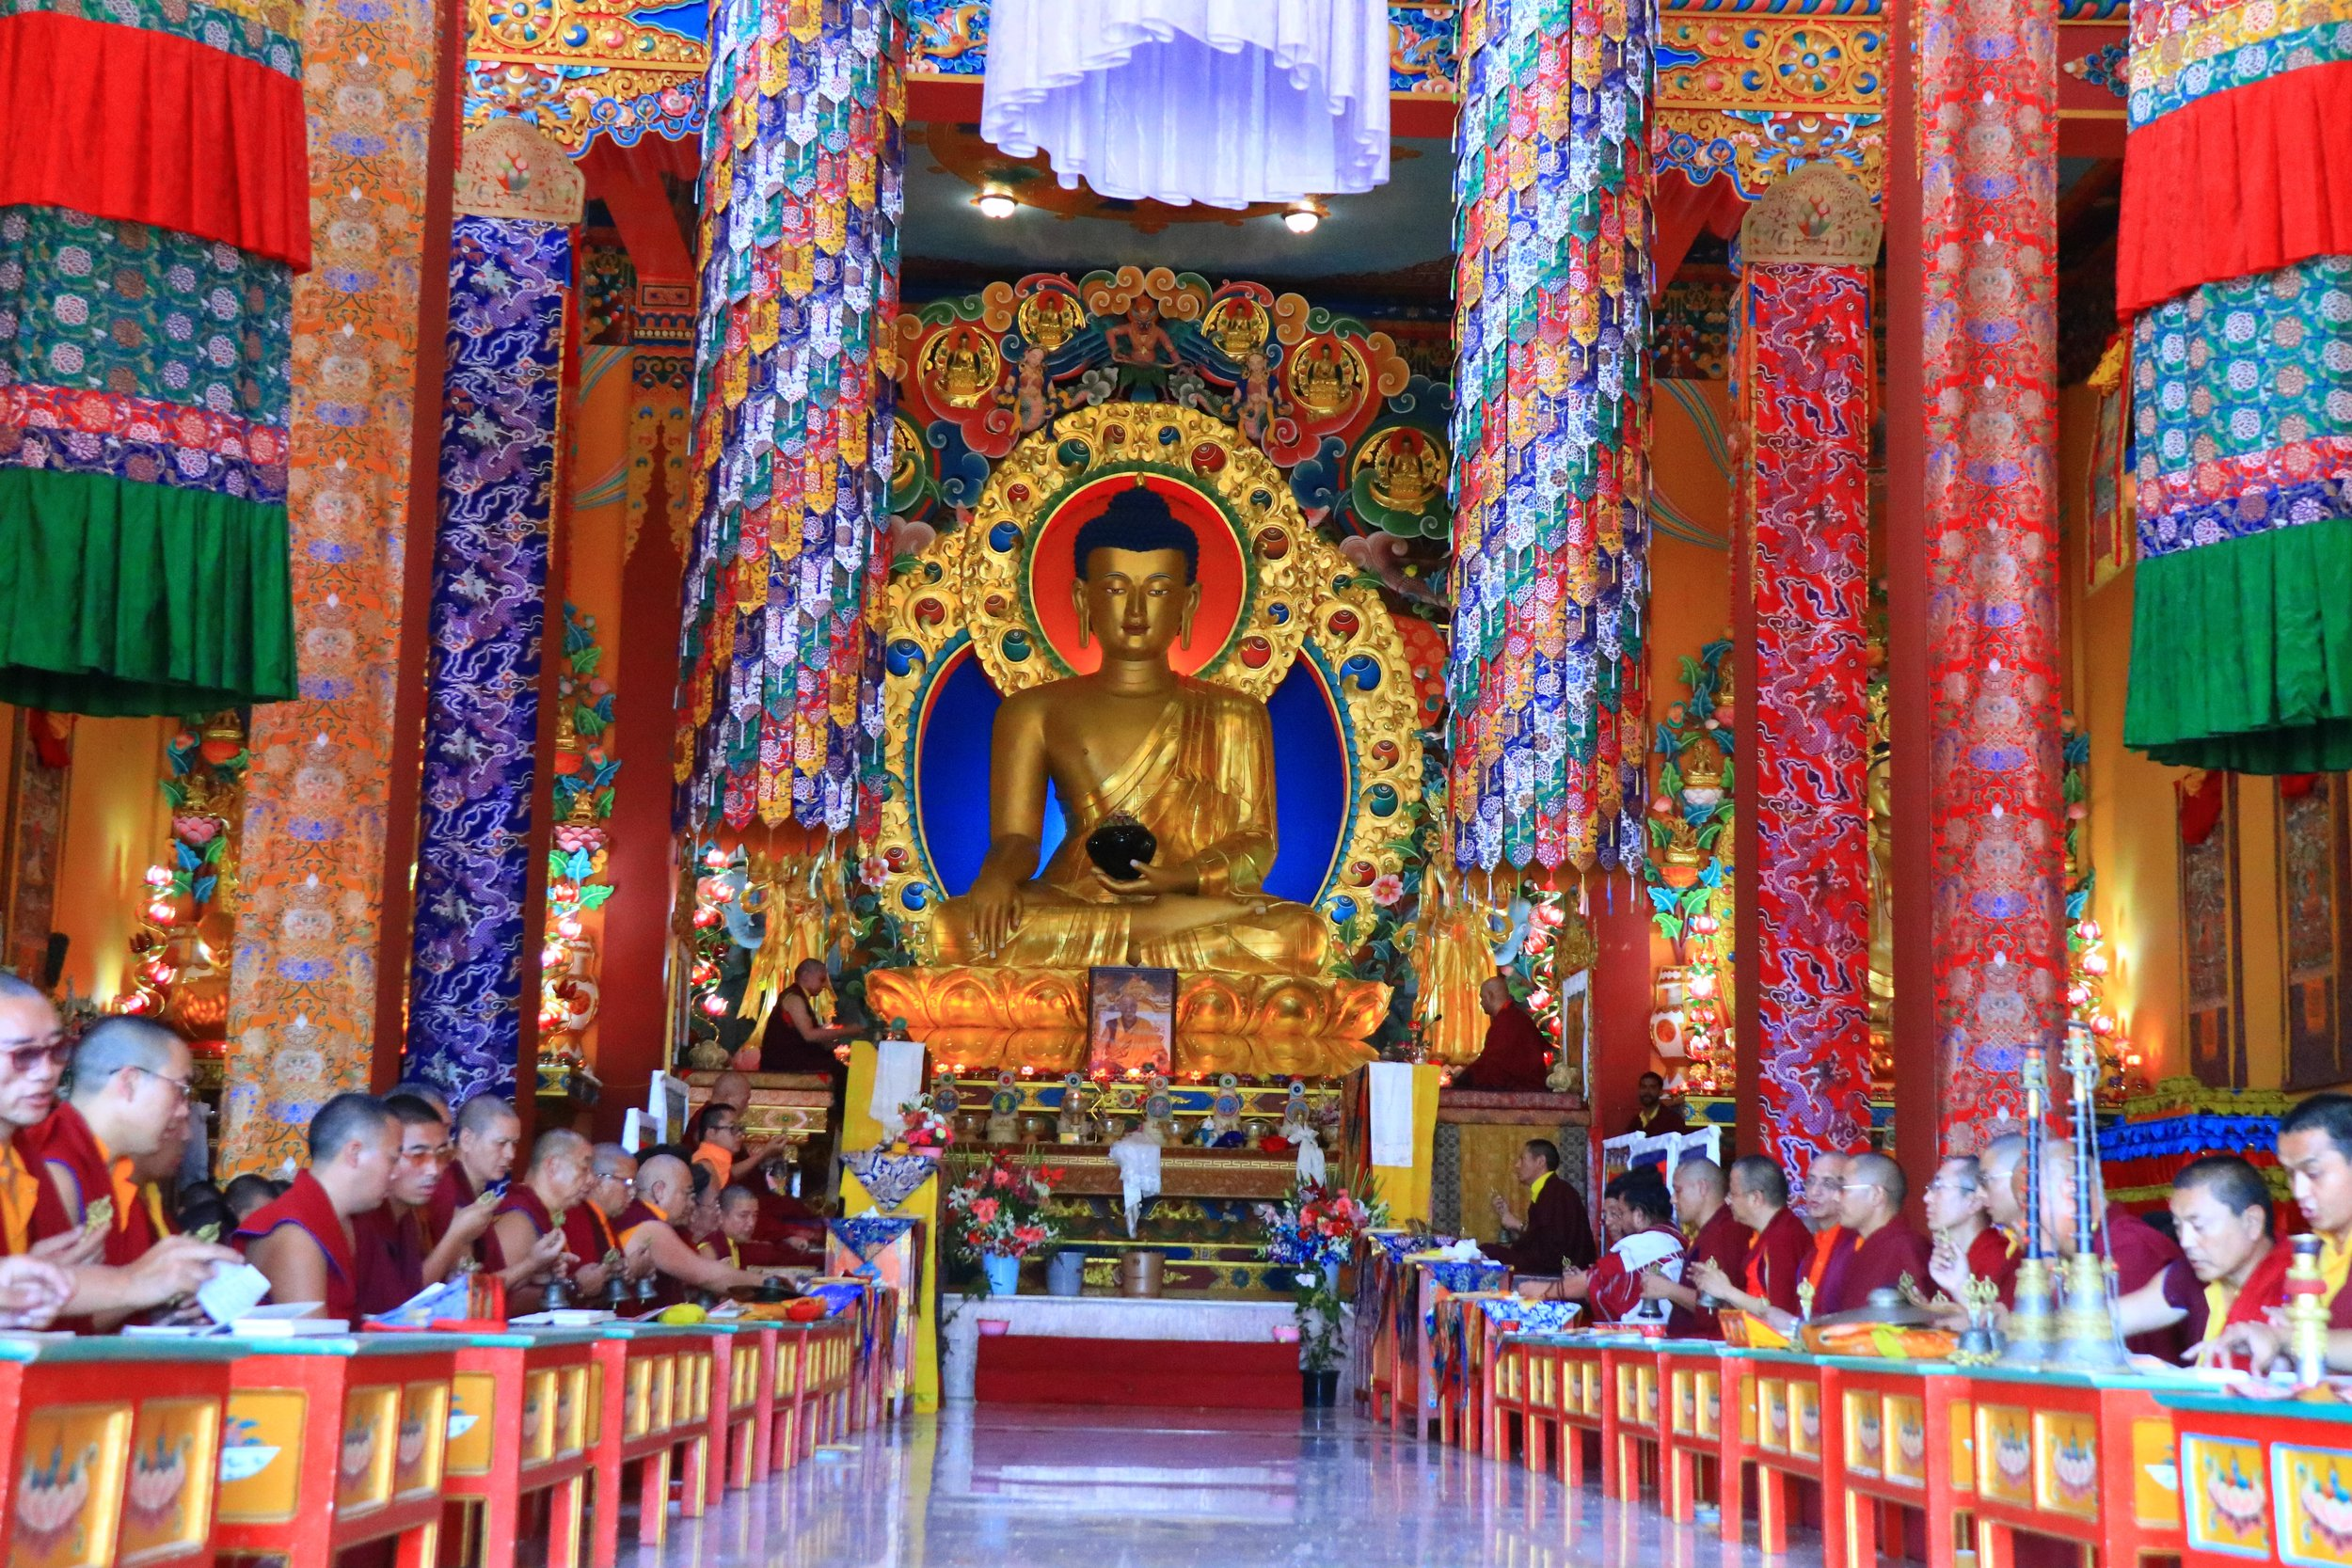 Dechen Choekhor Grand Puja at the main shrine hall.